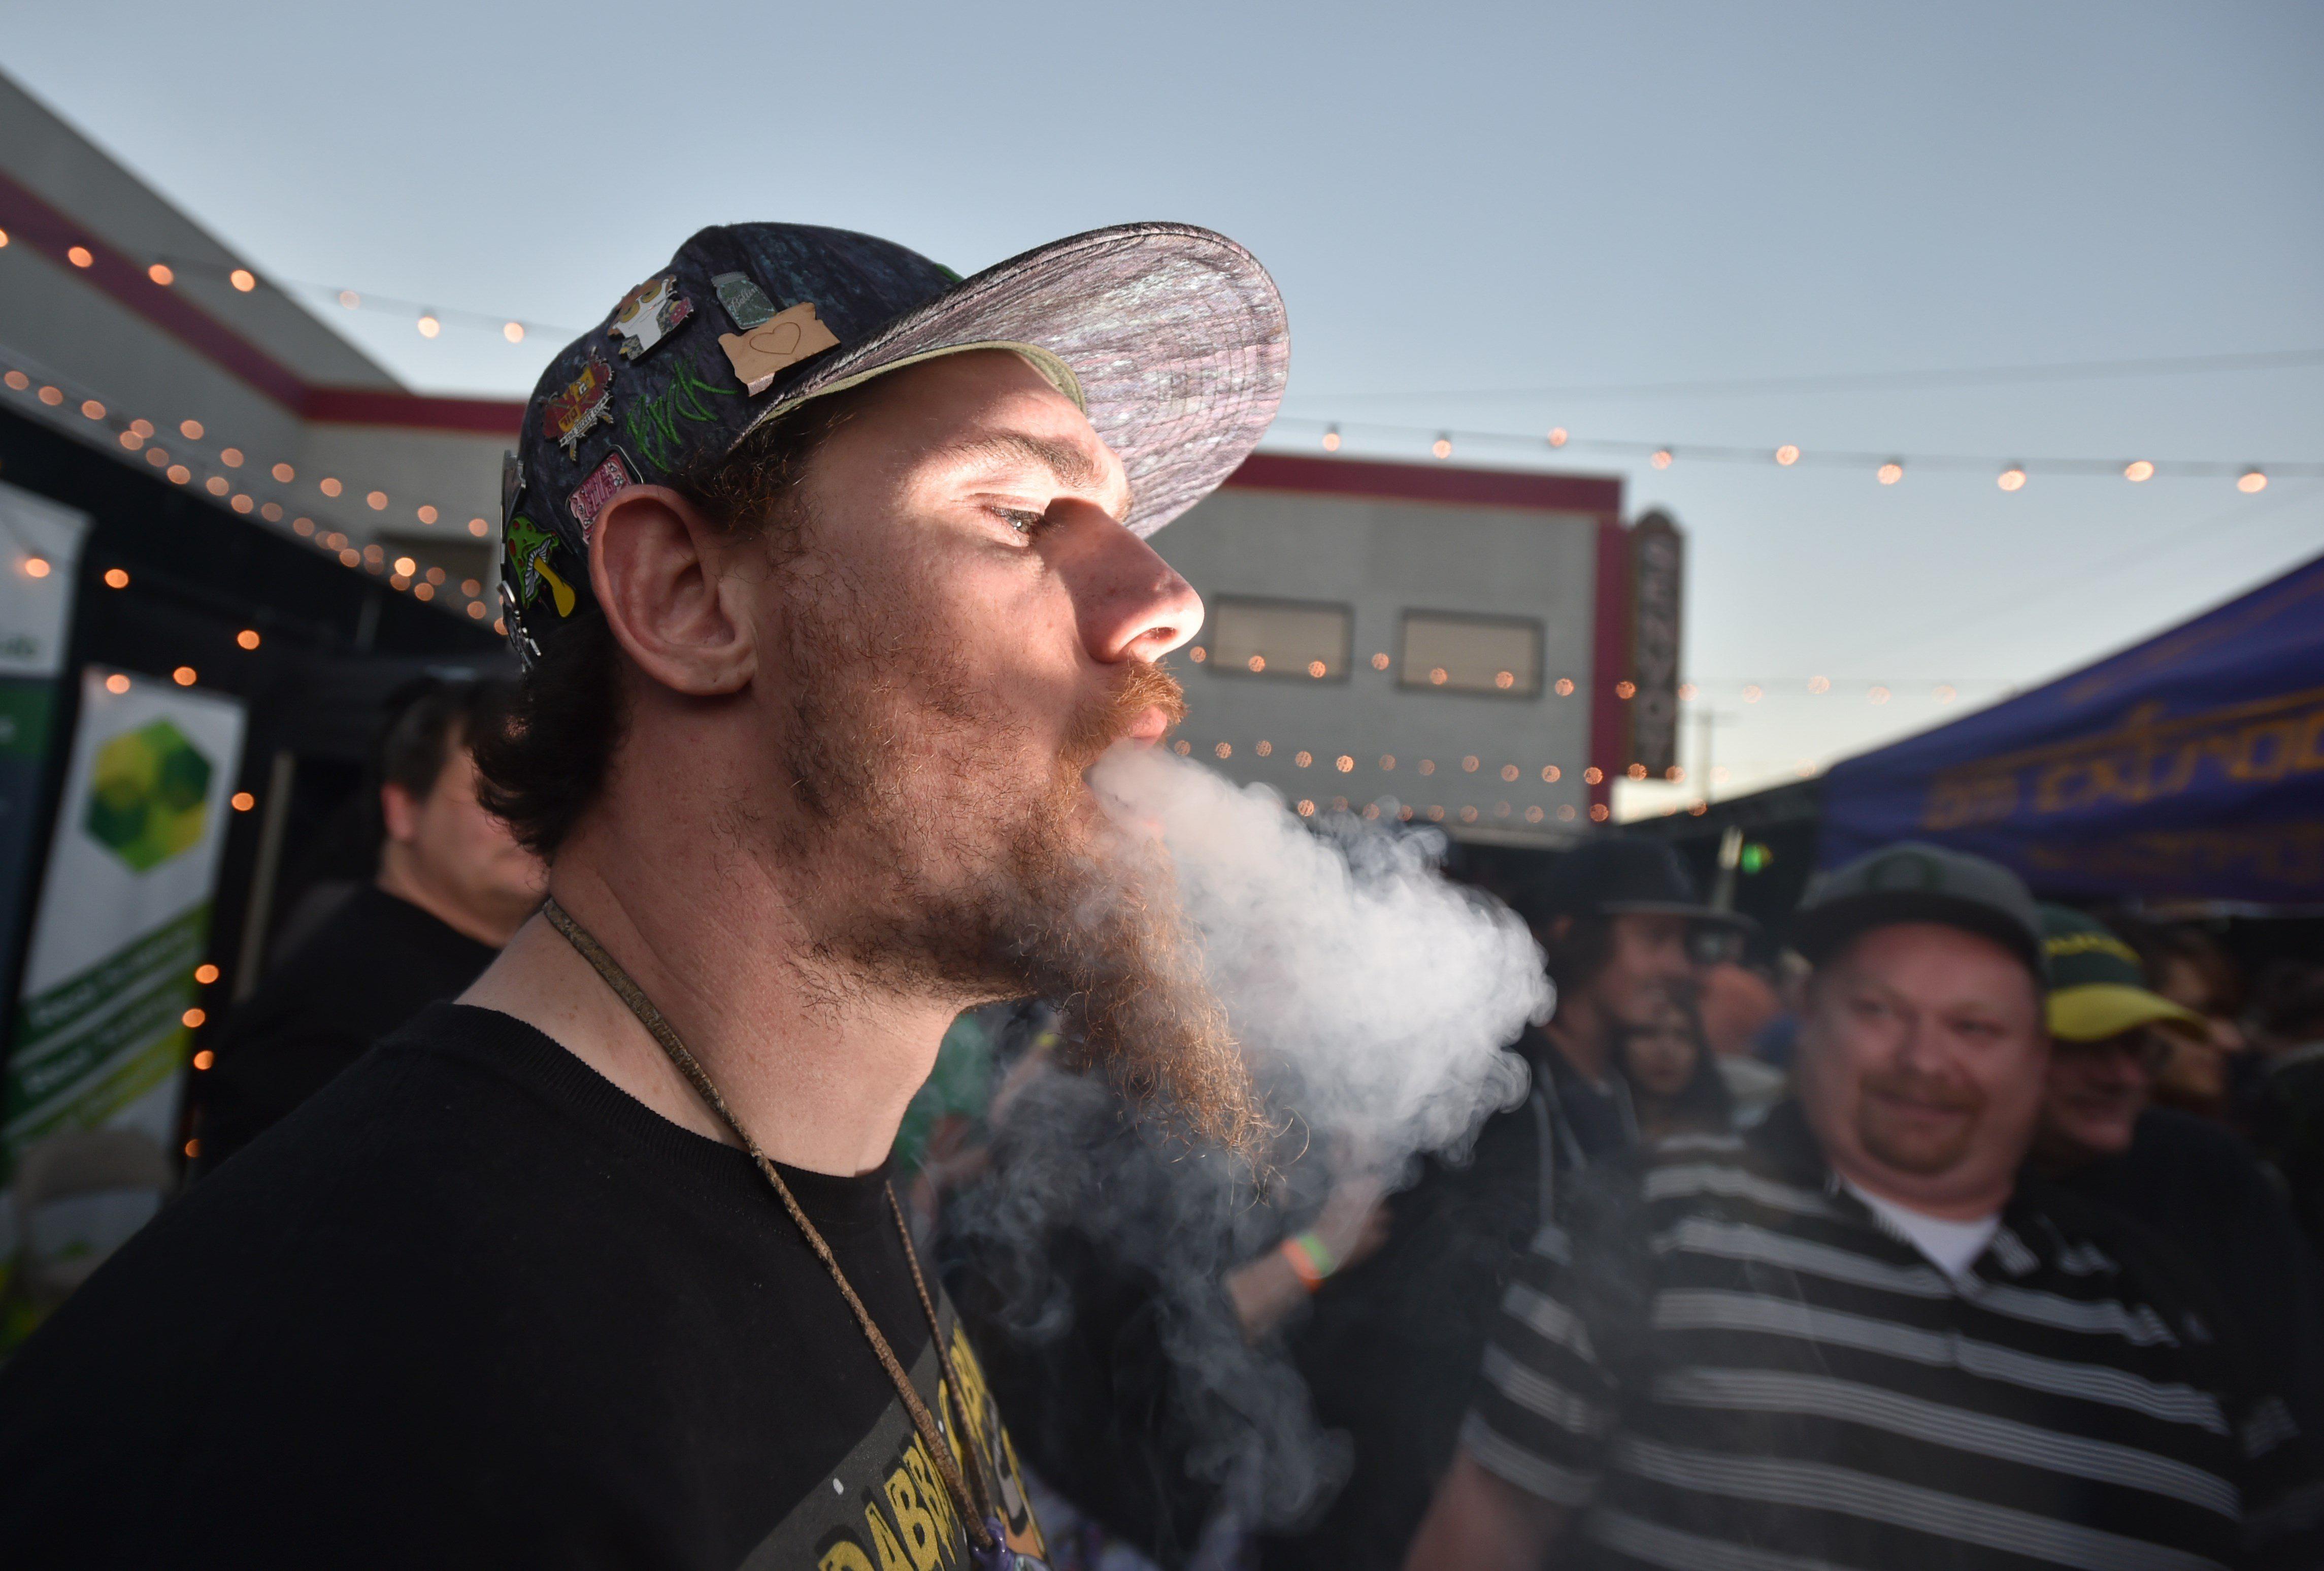 A man smokes marijuana at a cannabis competition in Portland, Oregon.